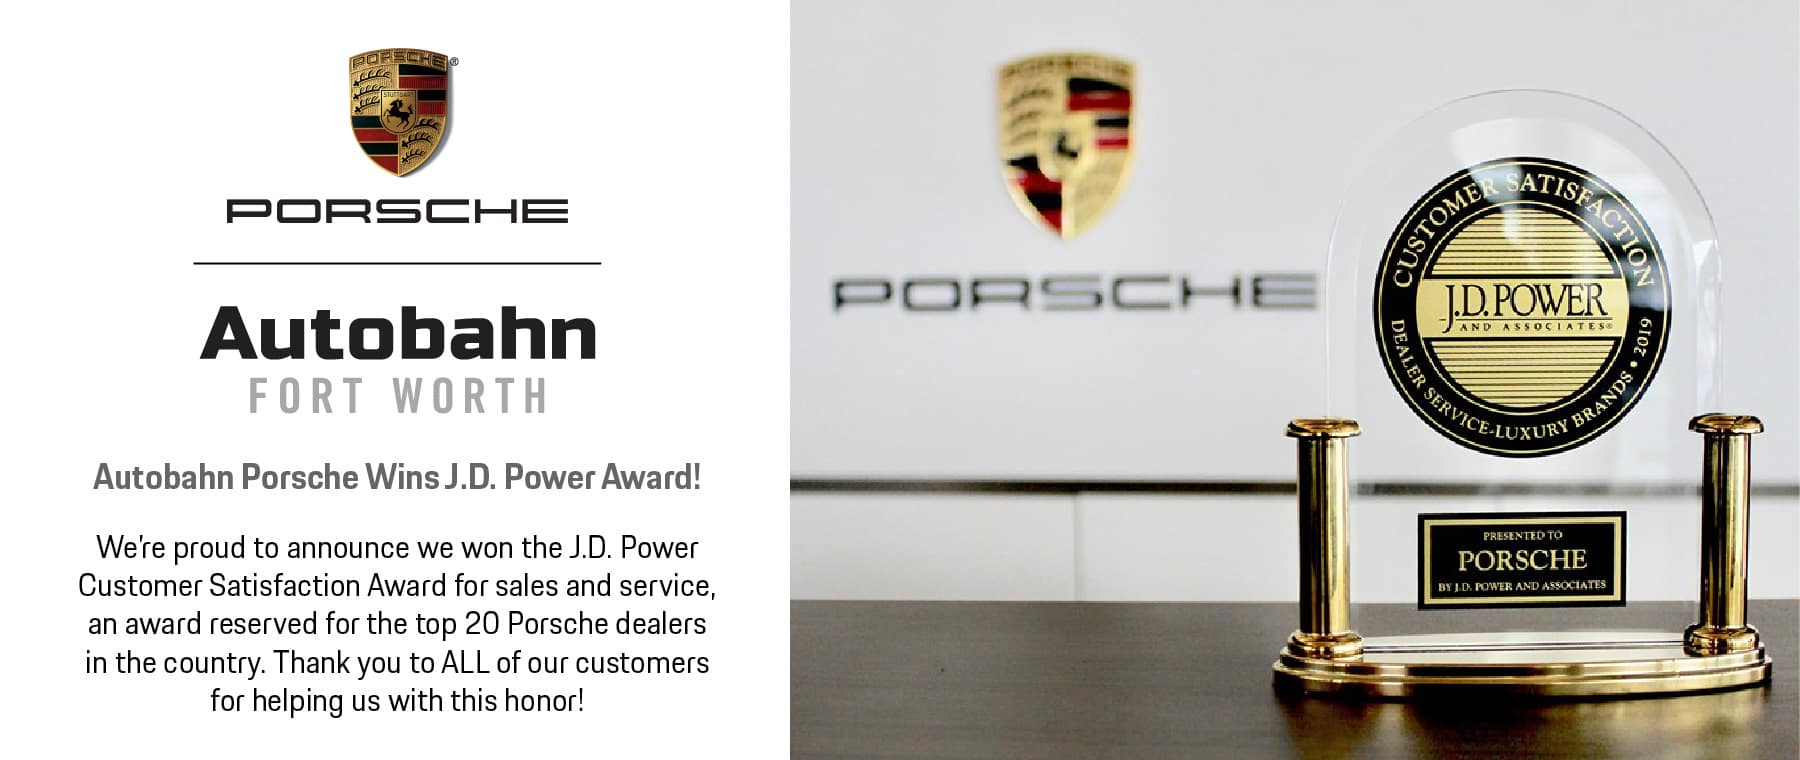 Autobahn Porsche Wins J.D. Power Customer Satisfaction Award!